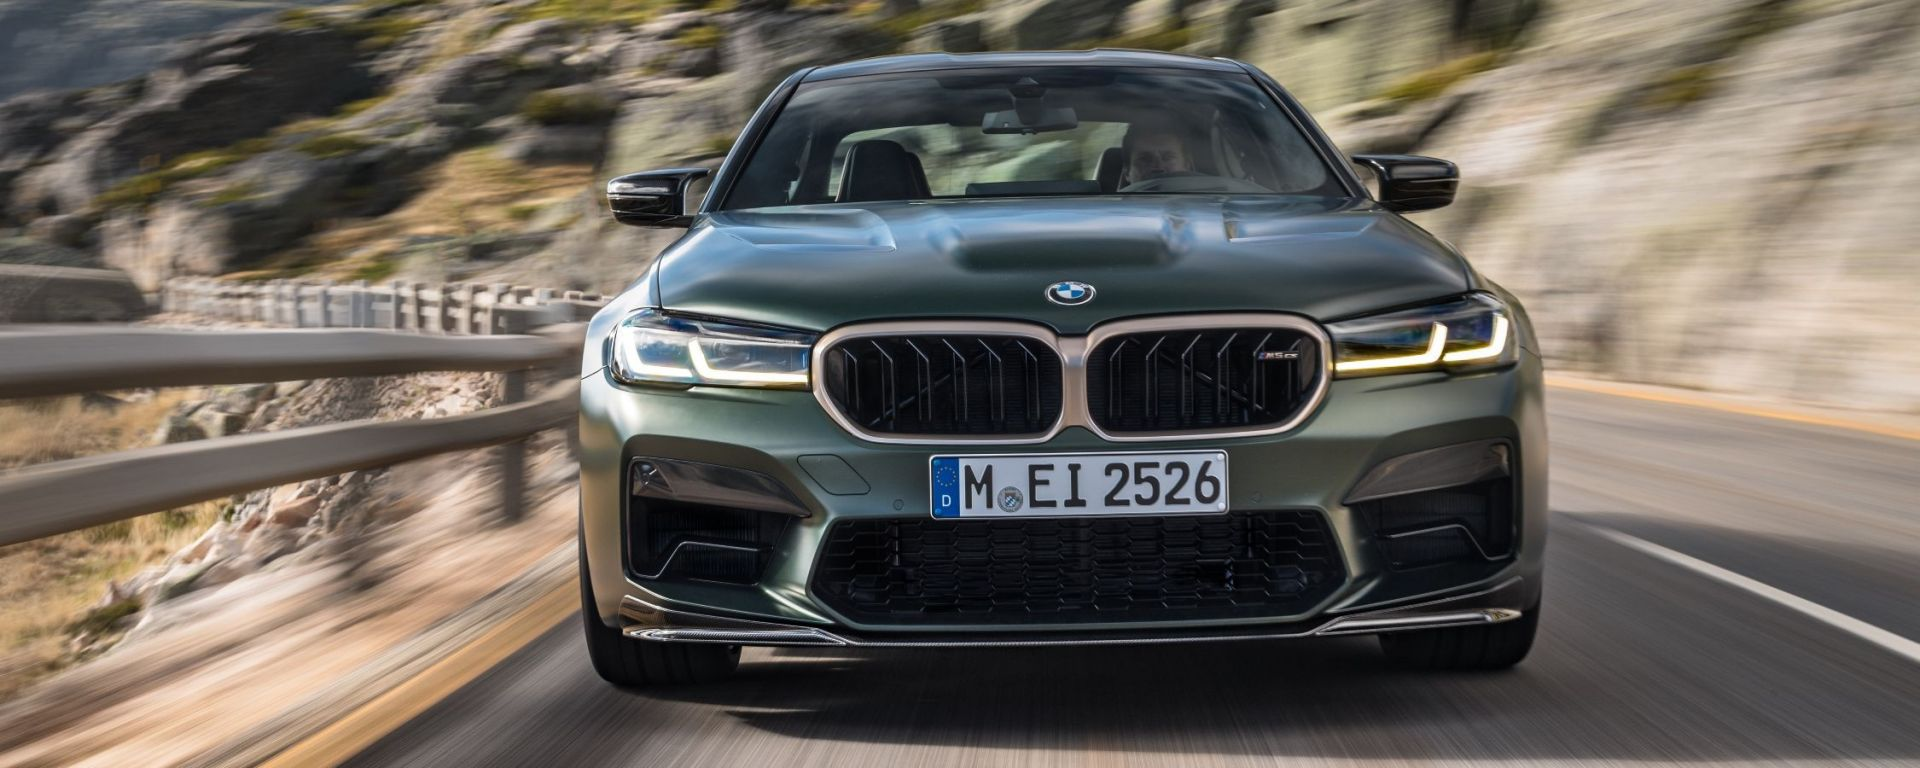 Nuova BMW M5 CS 2021